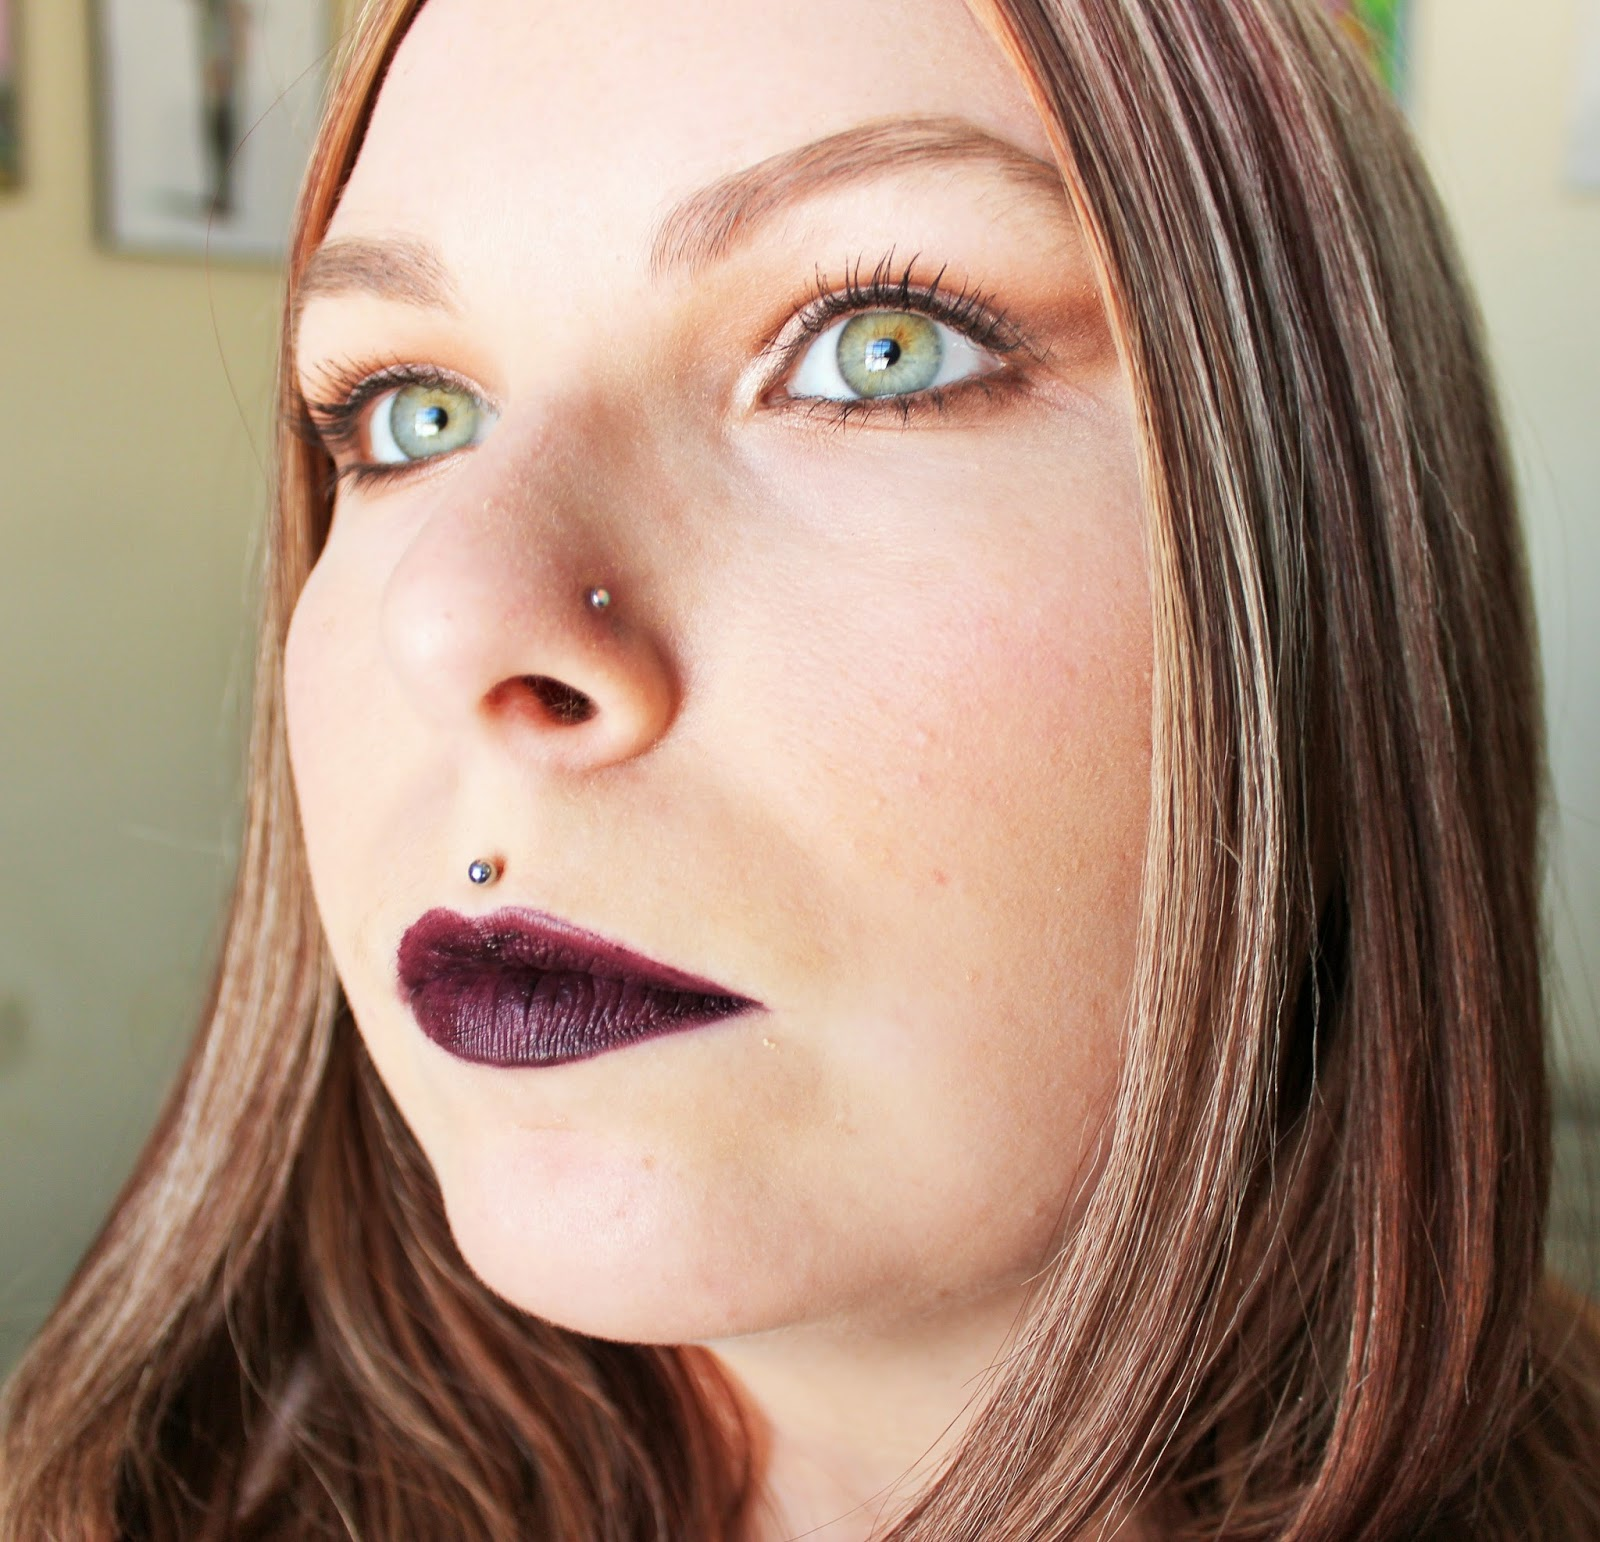 Nyx Matte Lip Cream Transylvania Swatch FOTD Colour Pop Makeup Geek